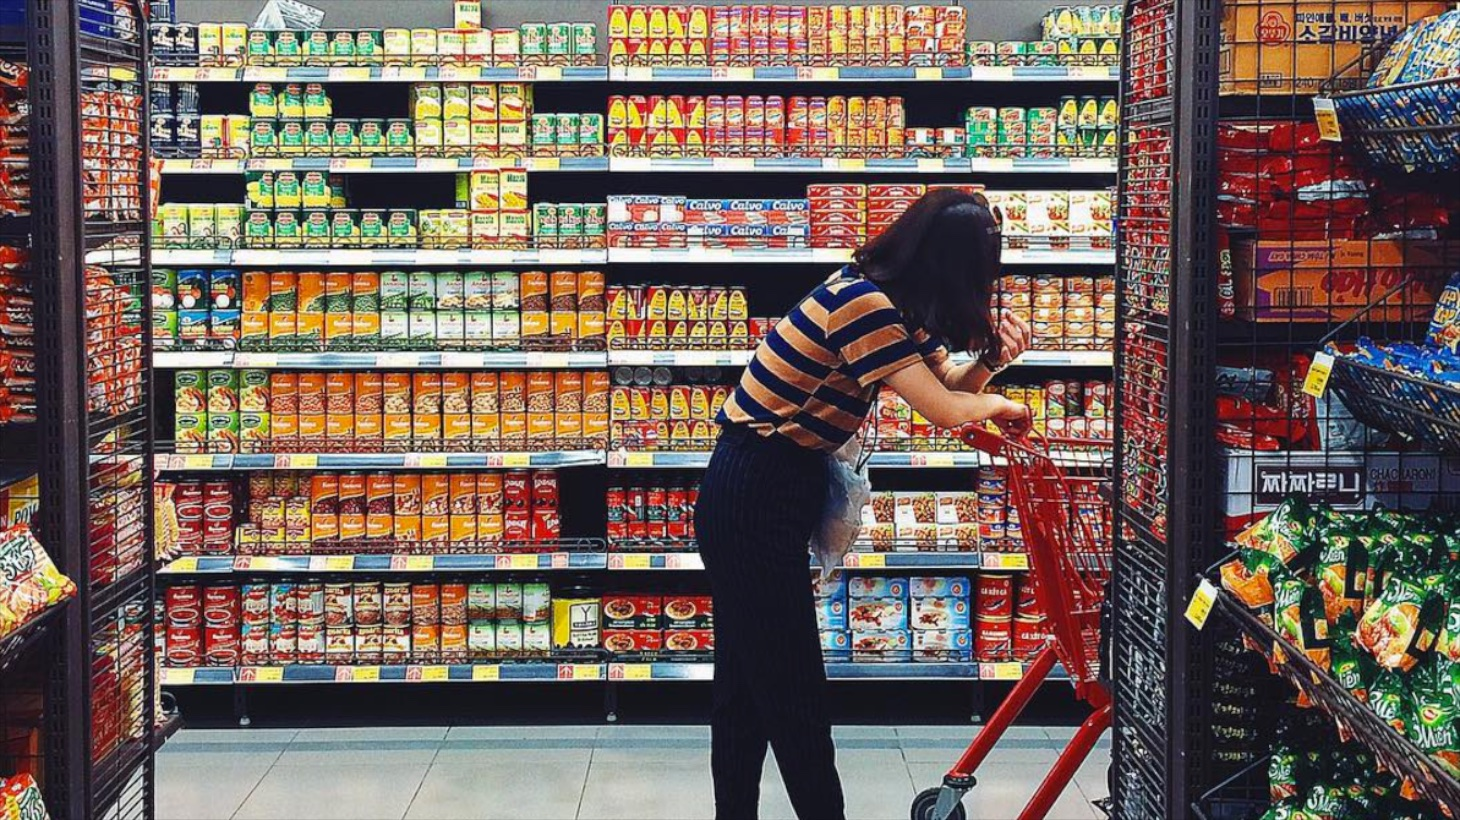 Magnetic resonance in food science : defining food by magnetic resonance 2015